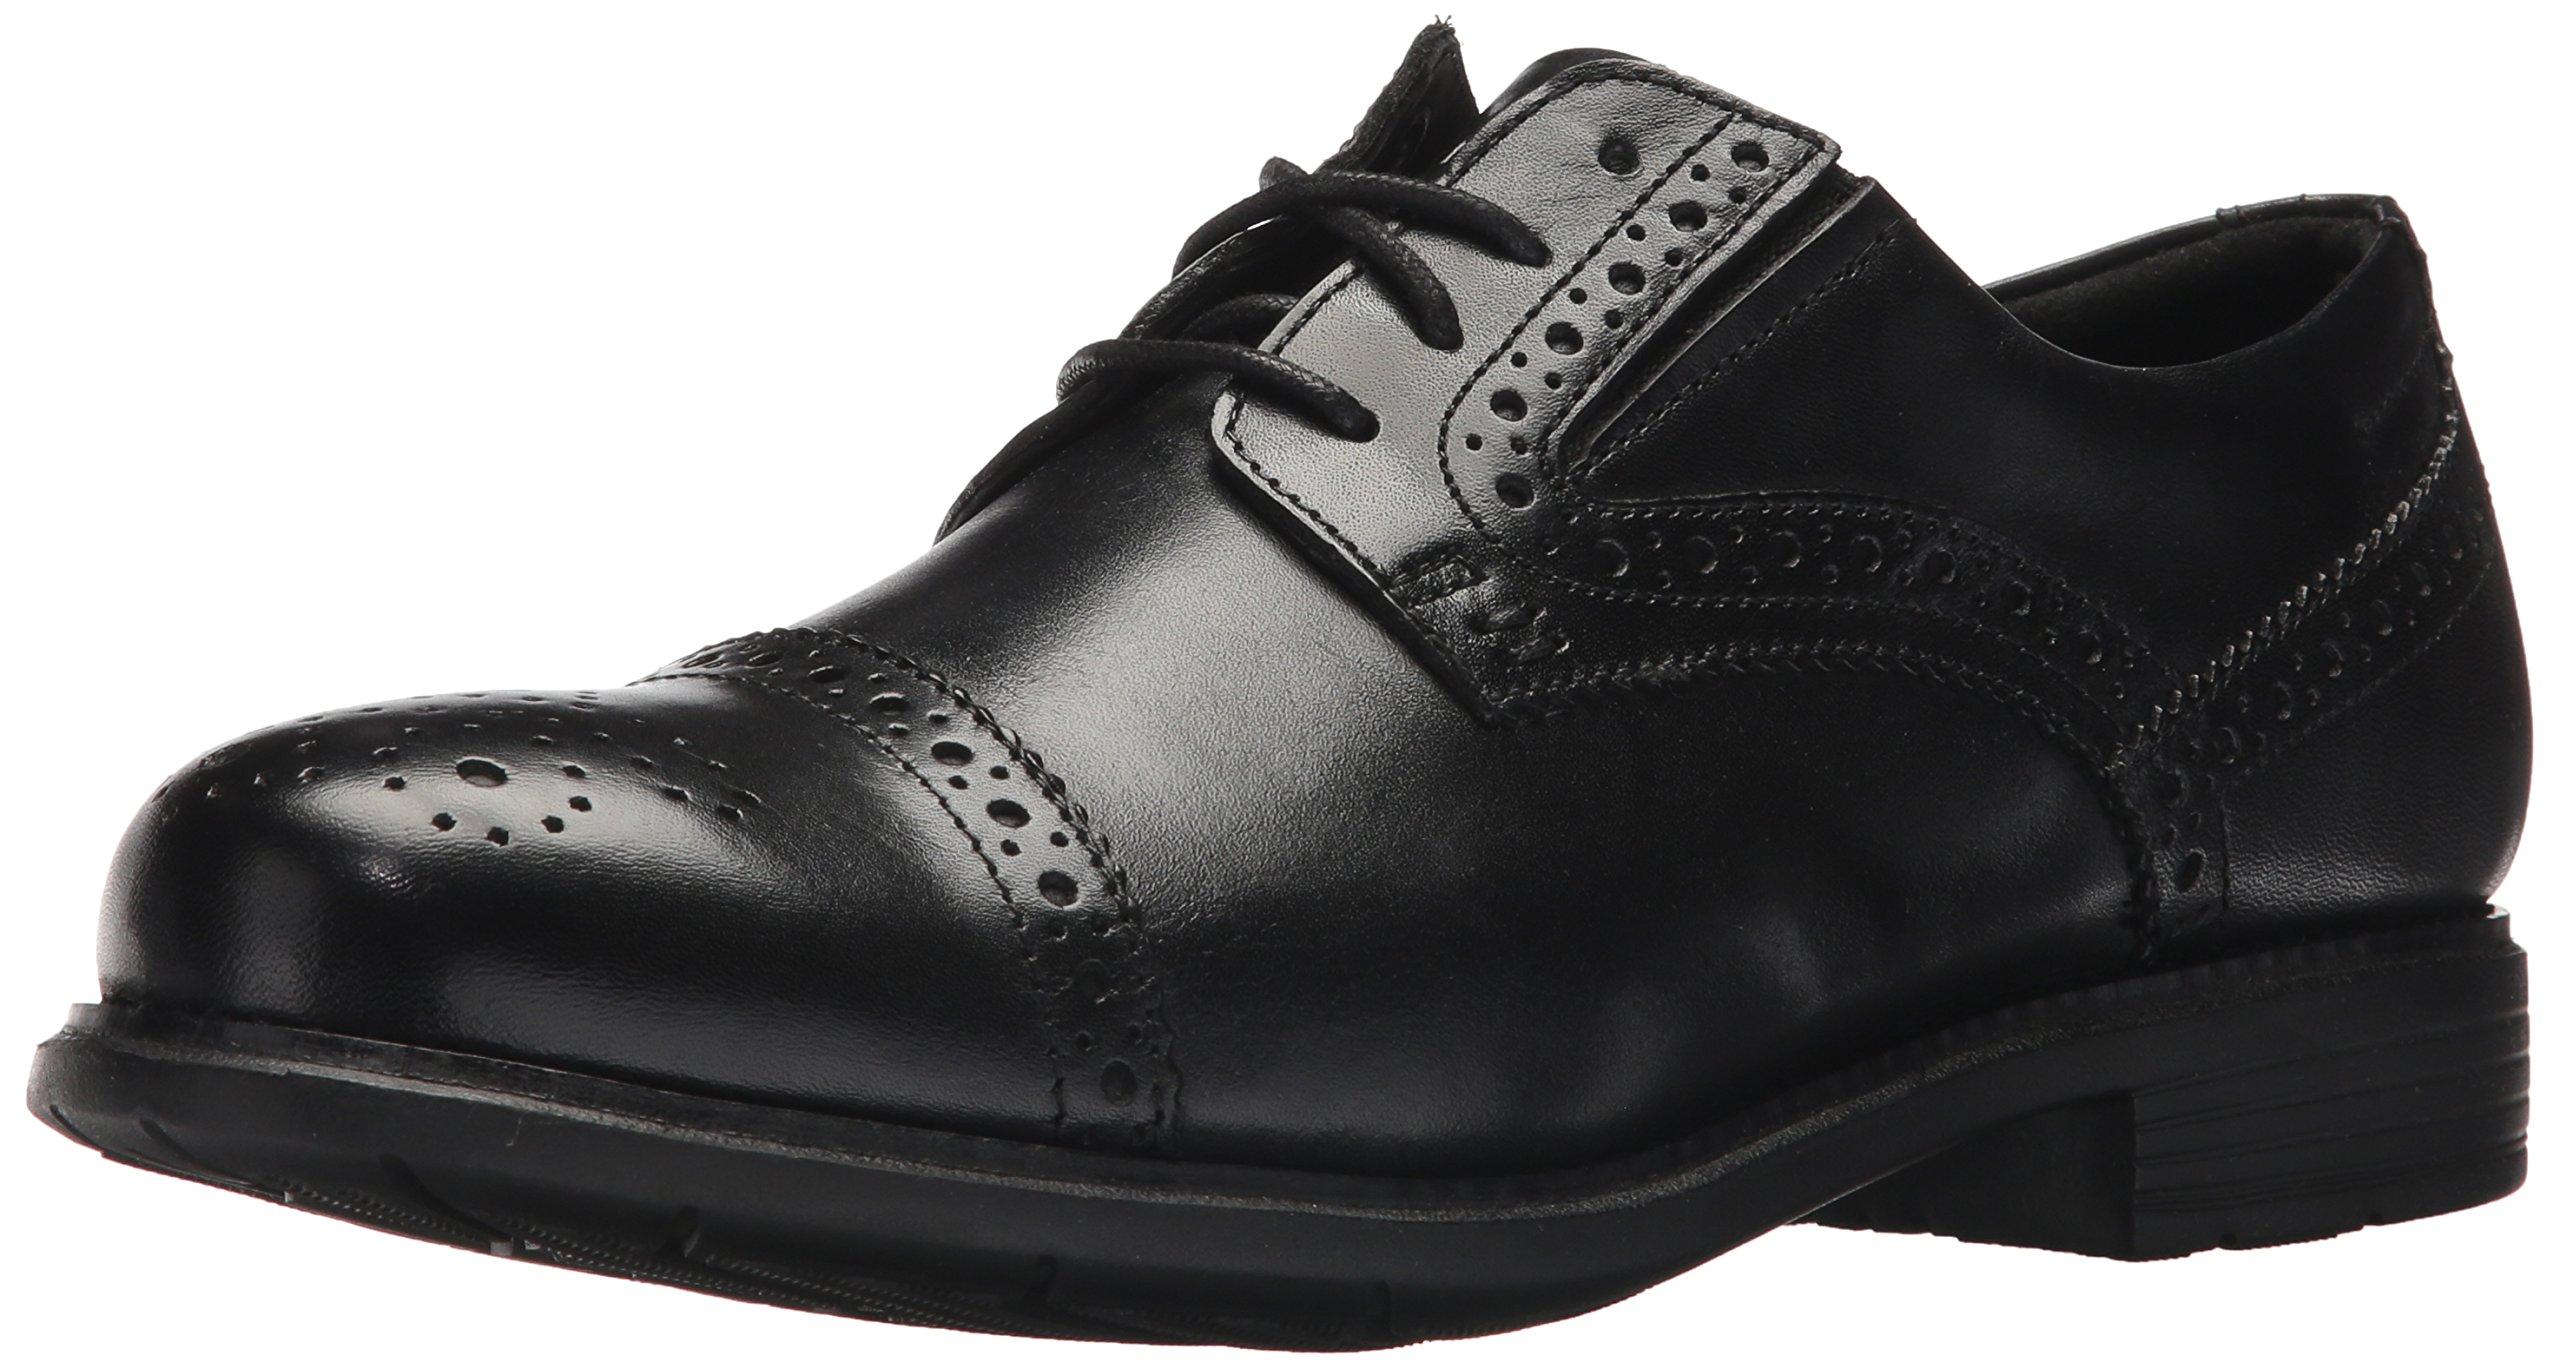 Rockport Men's Total Motion Dress Cap Toe Shoe, Black, 7.5 M US